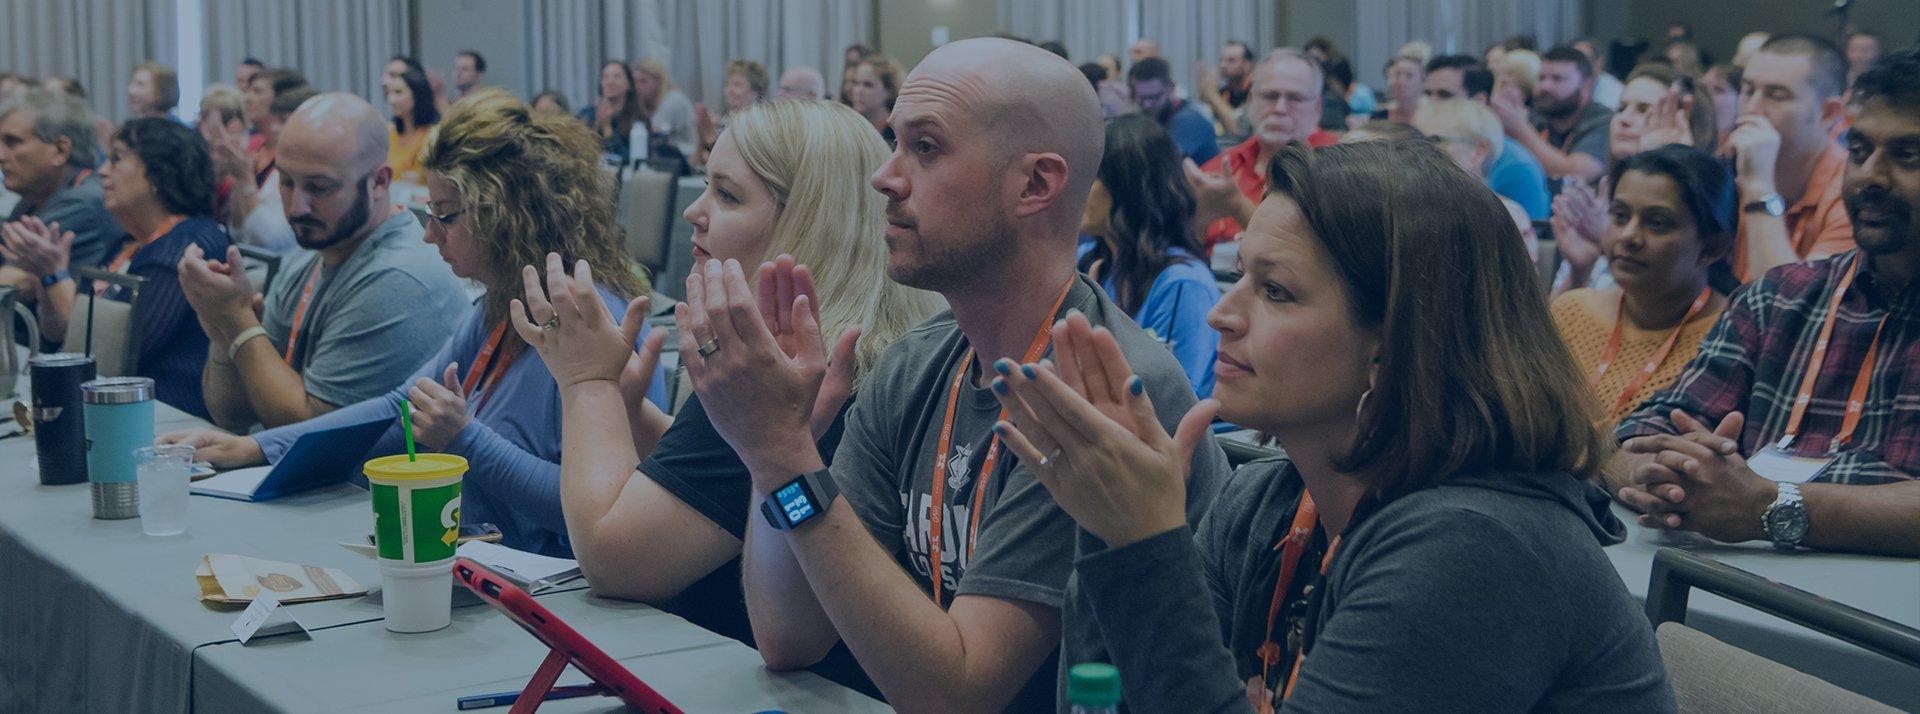 2020FPWRConference_Web_Hero